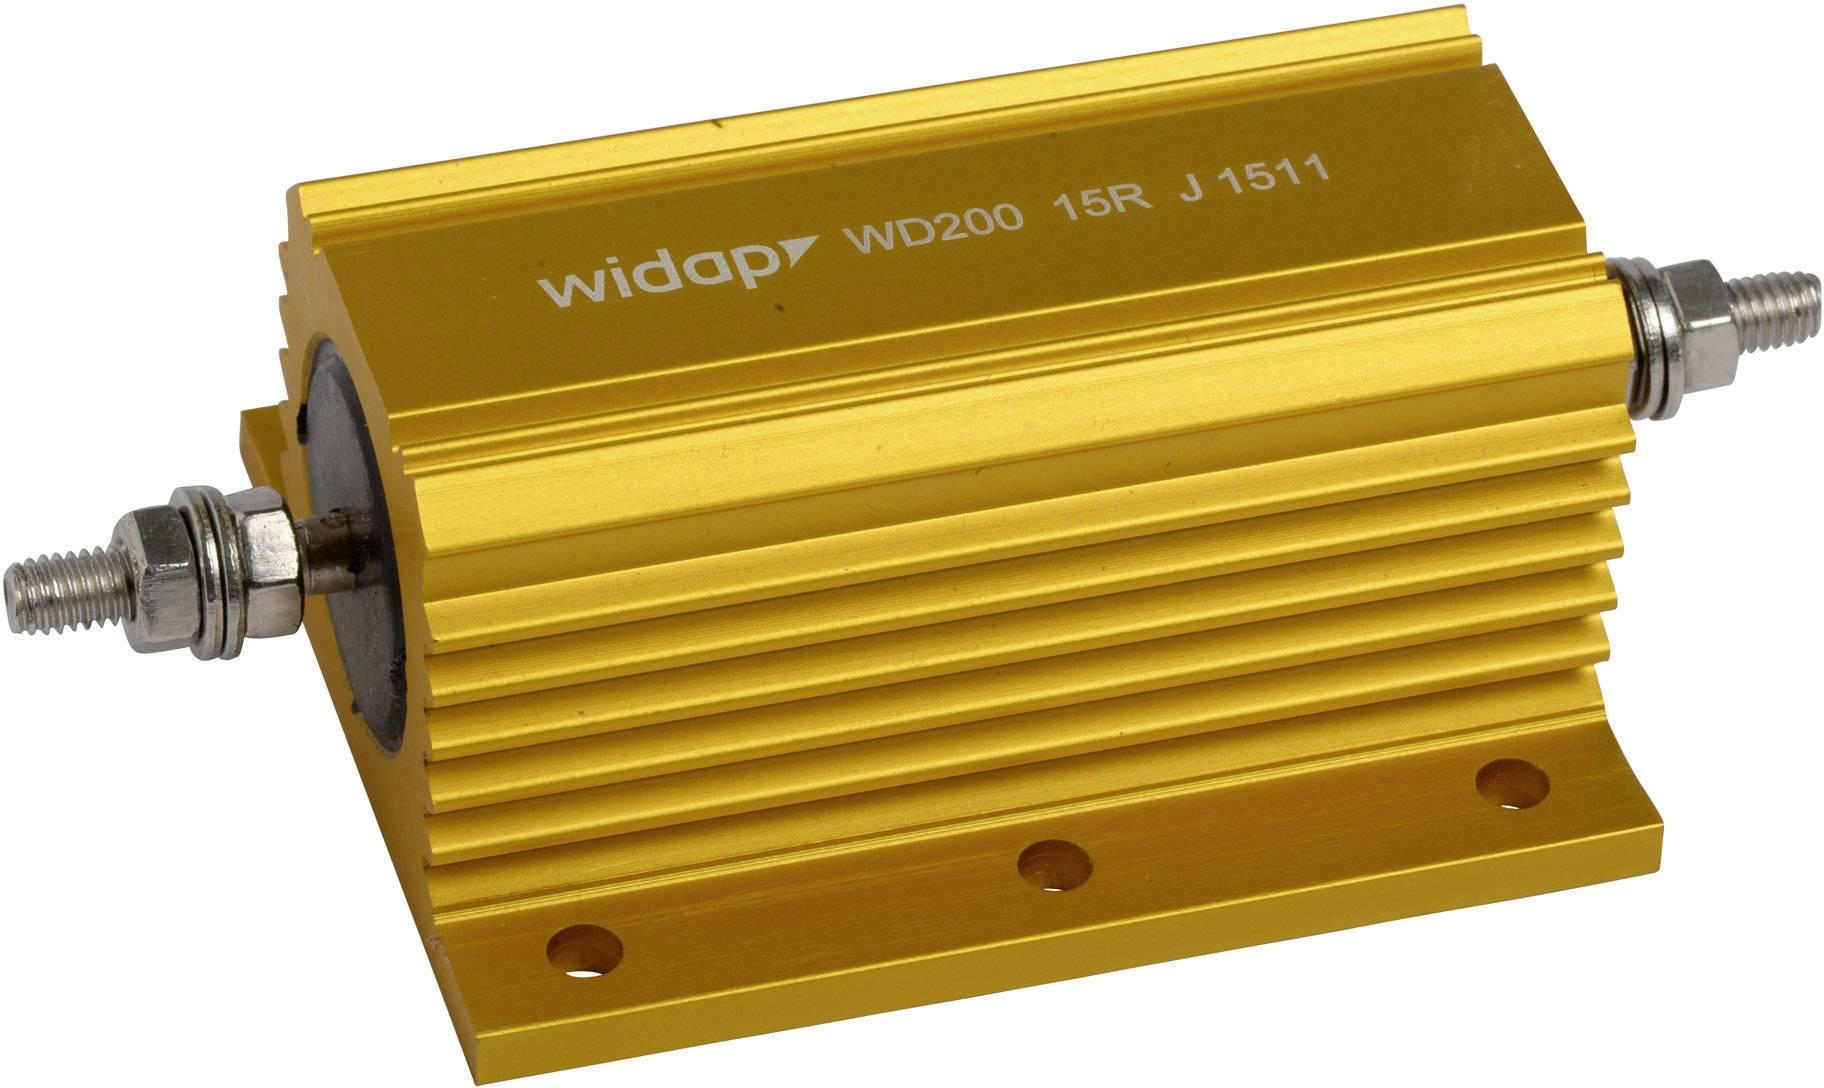 Drôtový rezistor Widap 160161, hodnota odporu 470 Ohm, 200 W, 1 ks